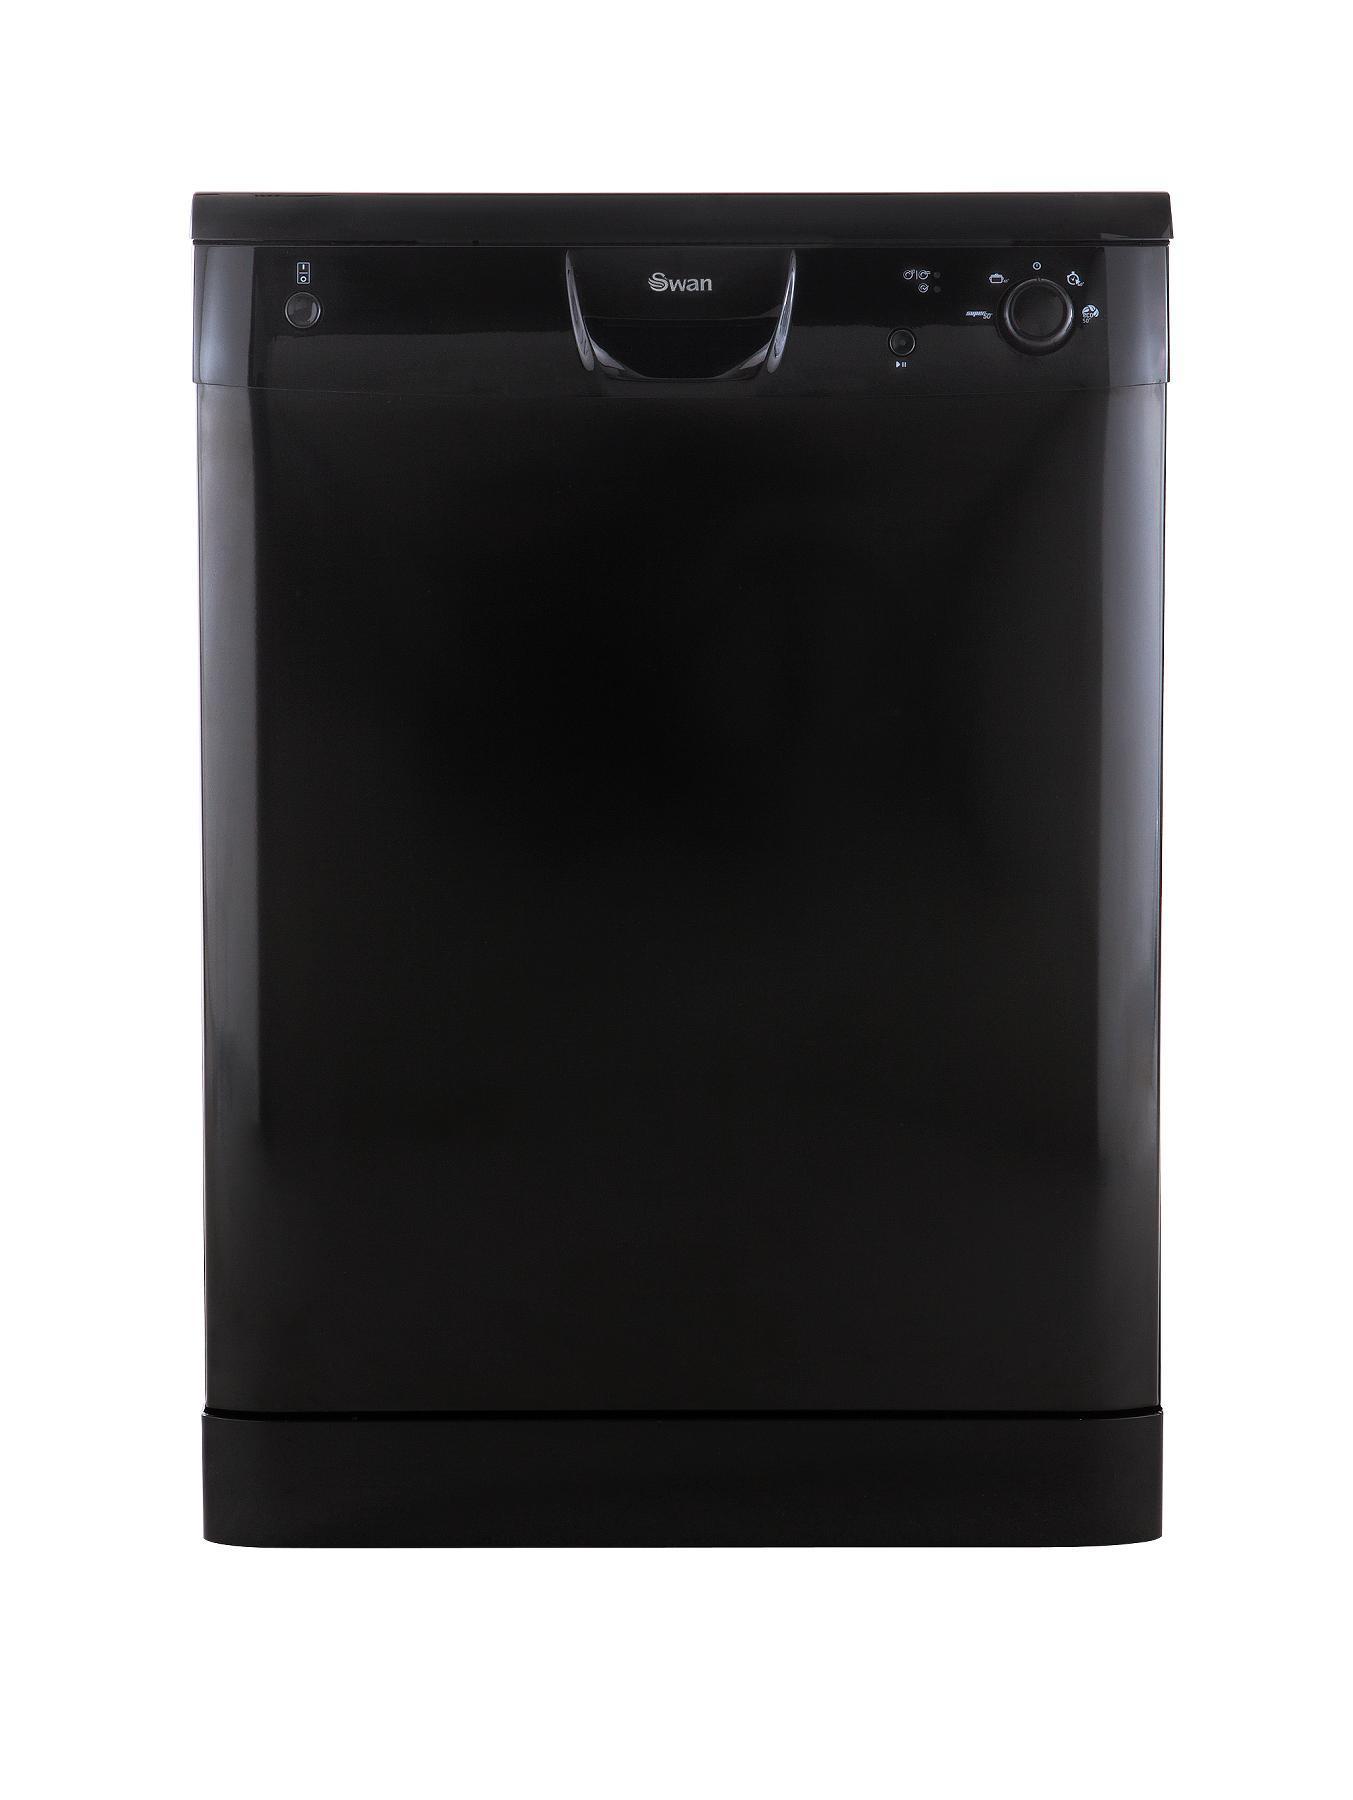 SDW2020B 12 Place Full Size Dishwasher - Black at Littlewoods